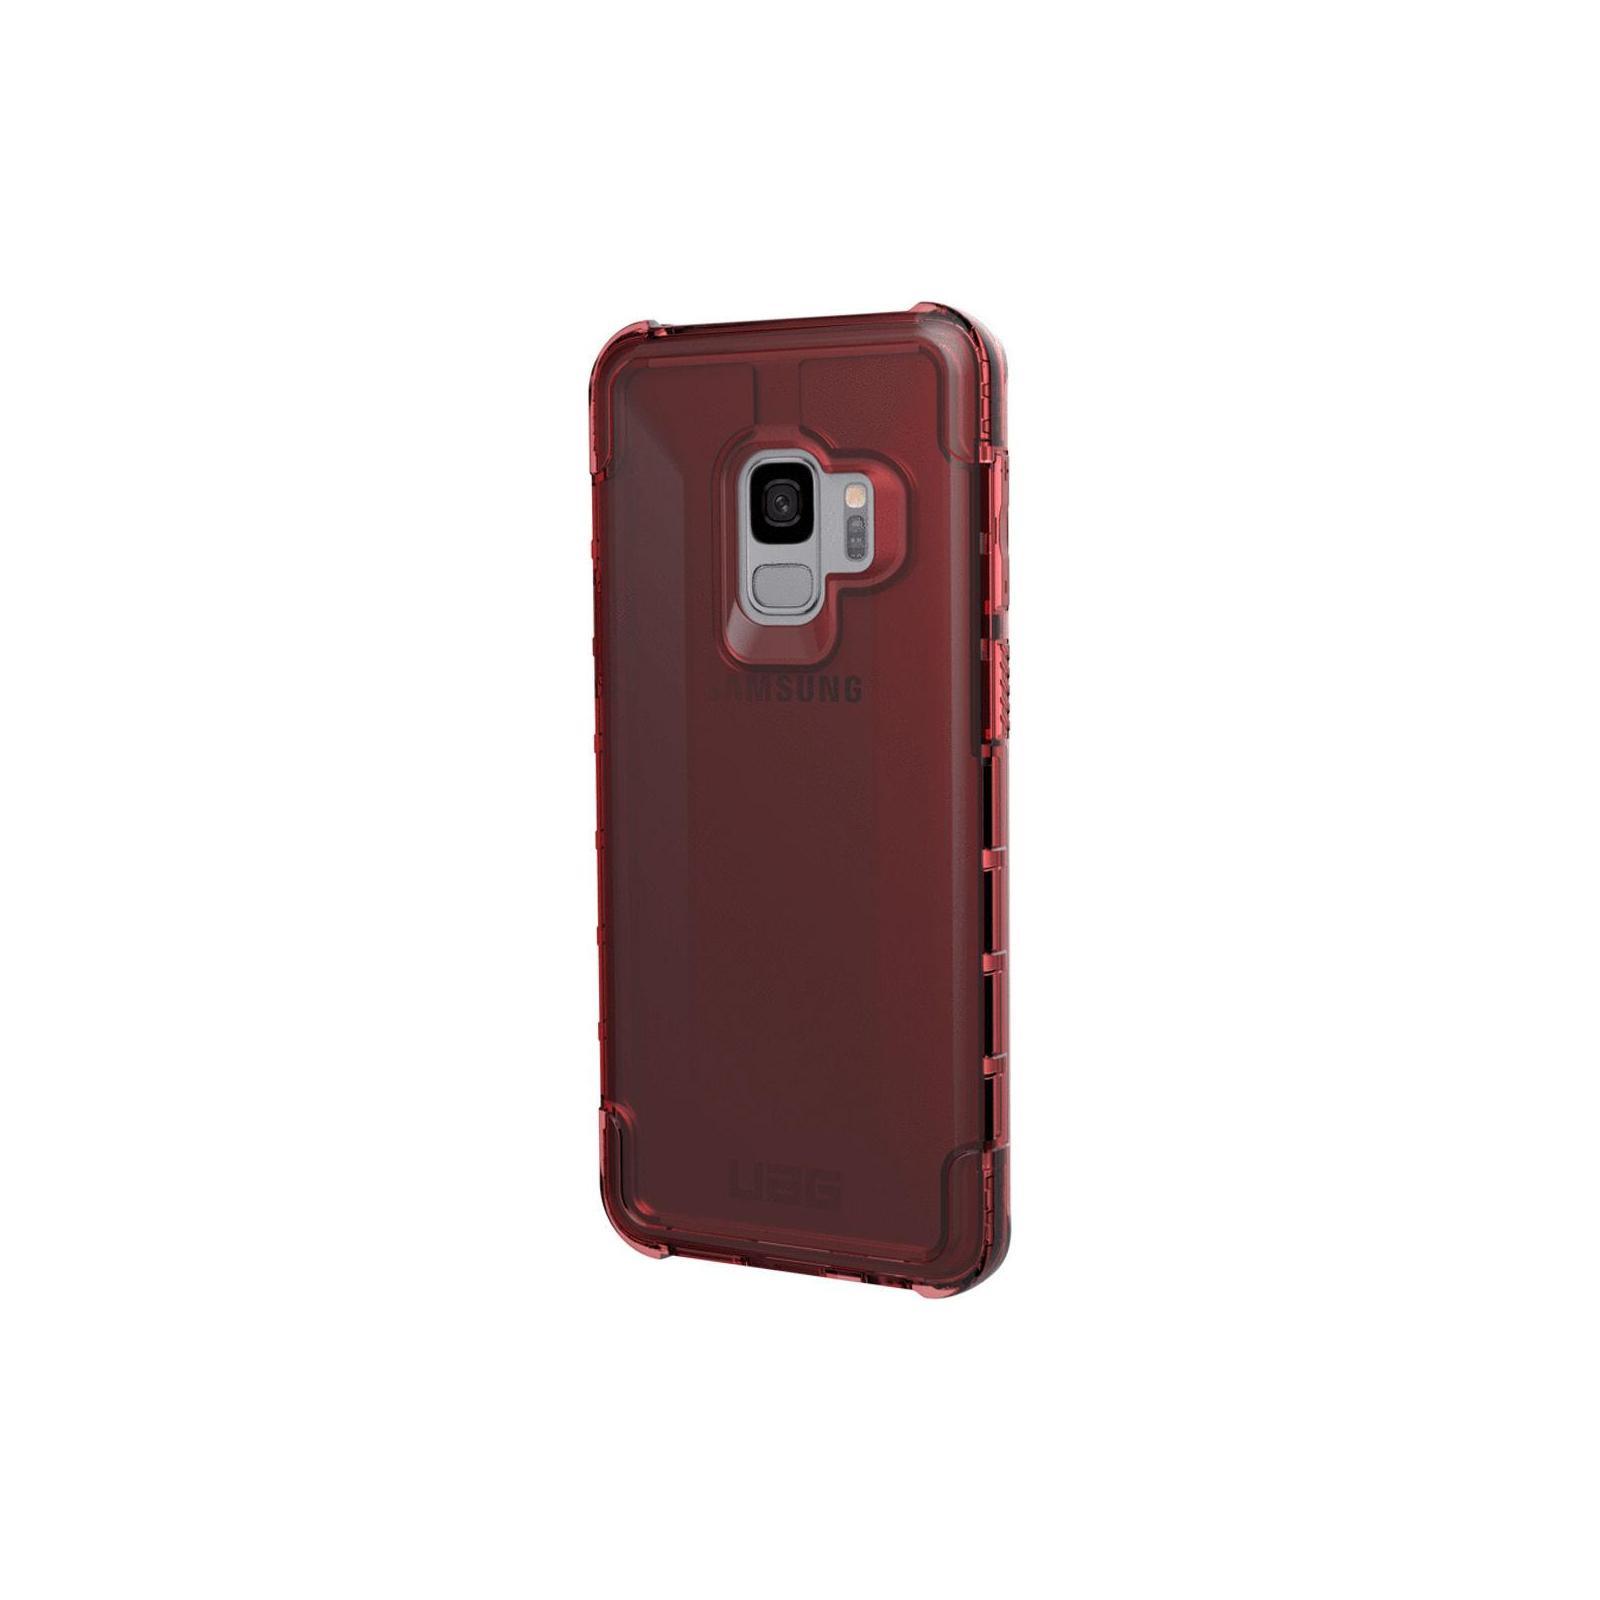 Чехол для моб. телефона Urban Armor Gear Galaxy S9 Plyo Case Crimson (GLXS9-Y-CR) изображение 3